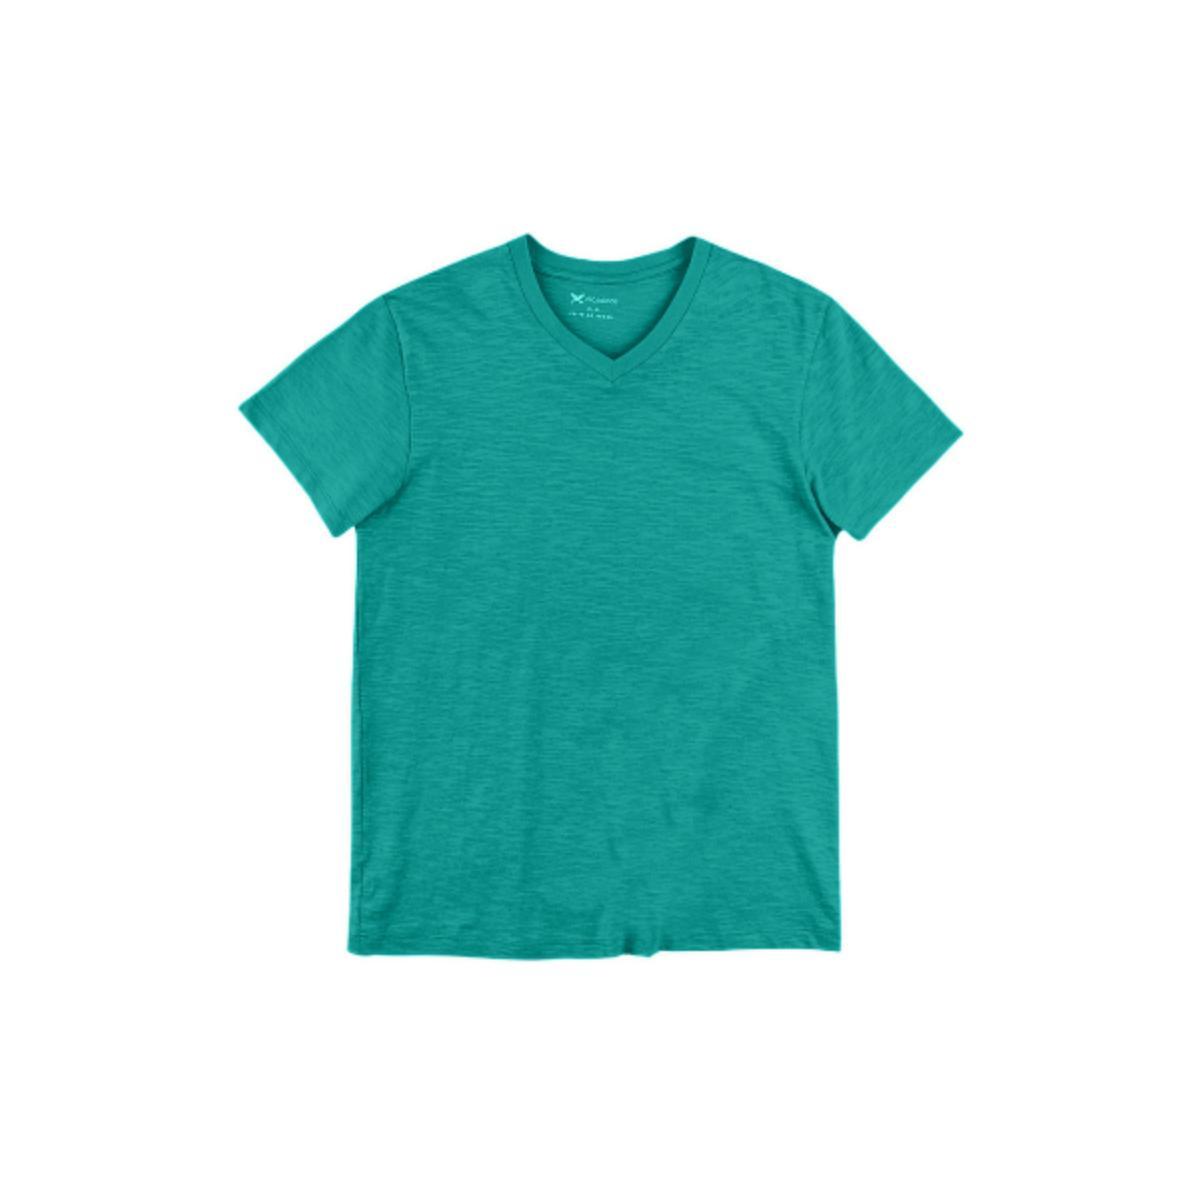 Camiseta Masculina Hering N2k5 W9ben Verde